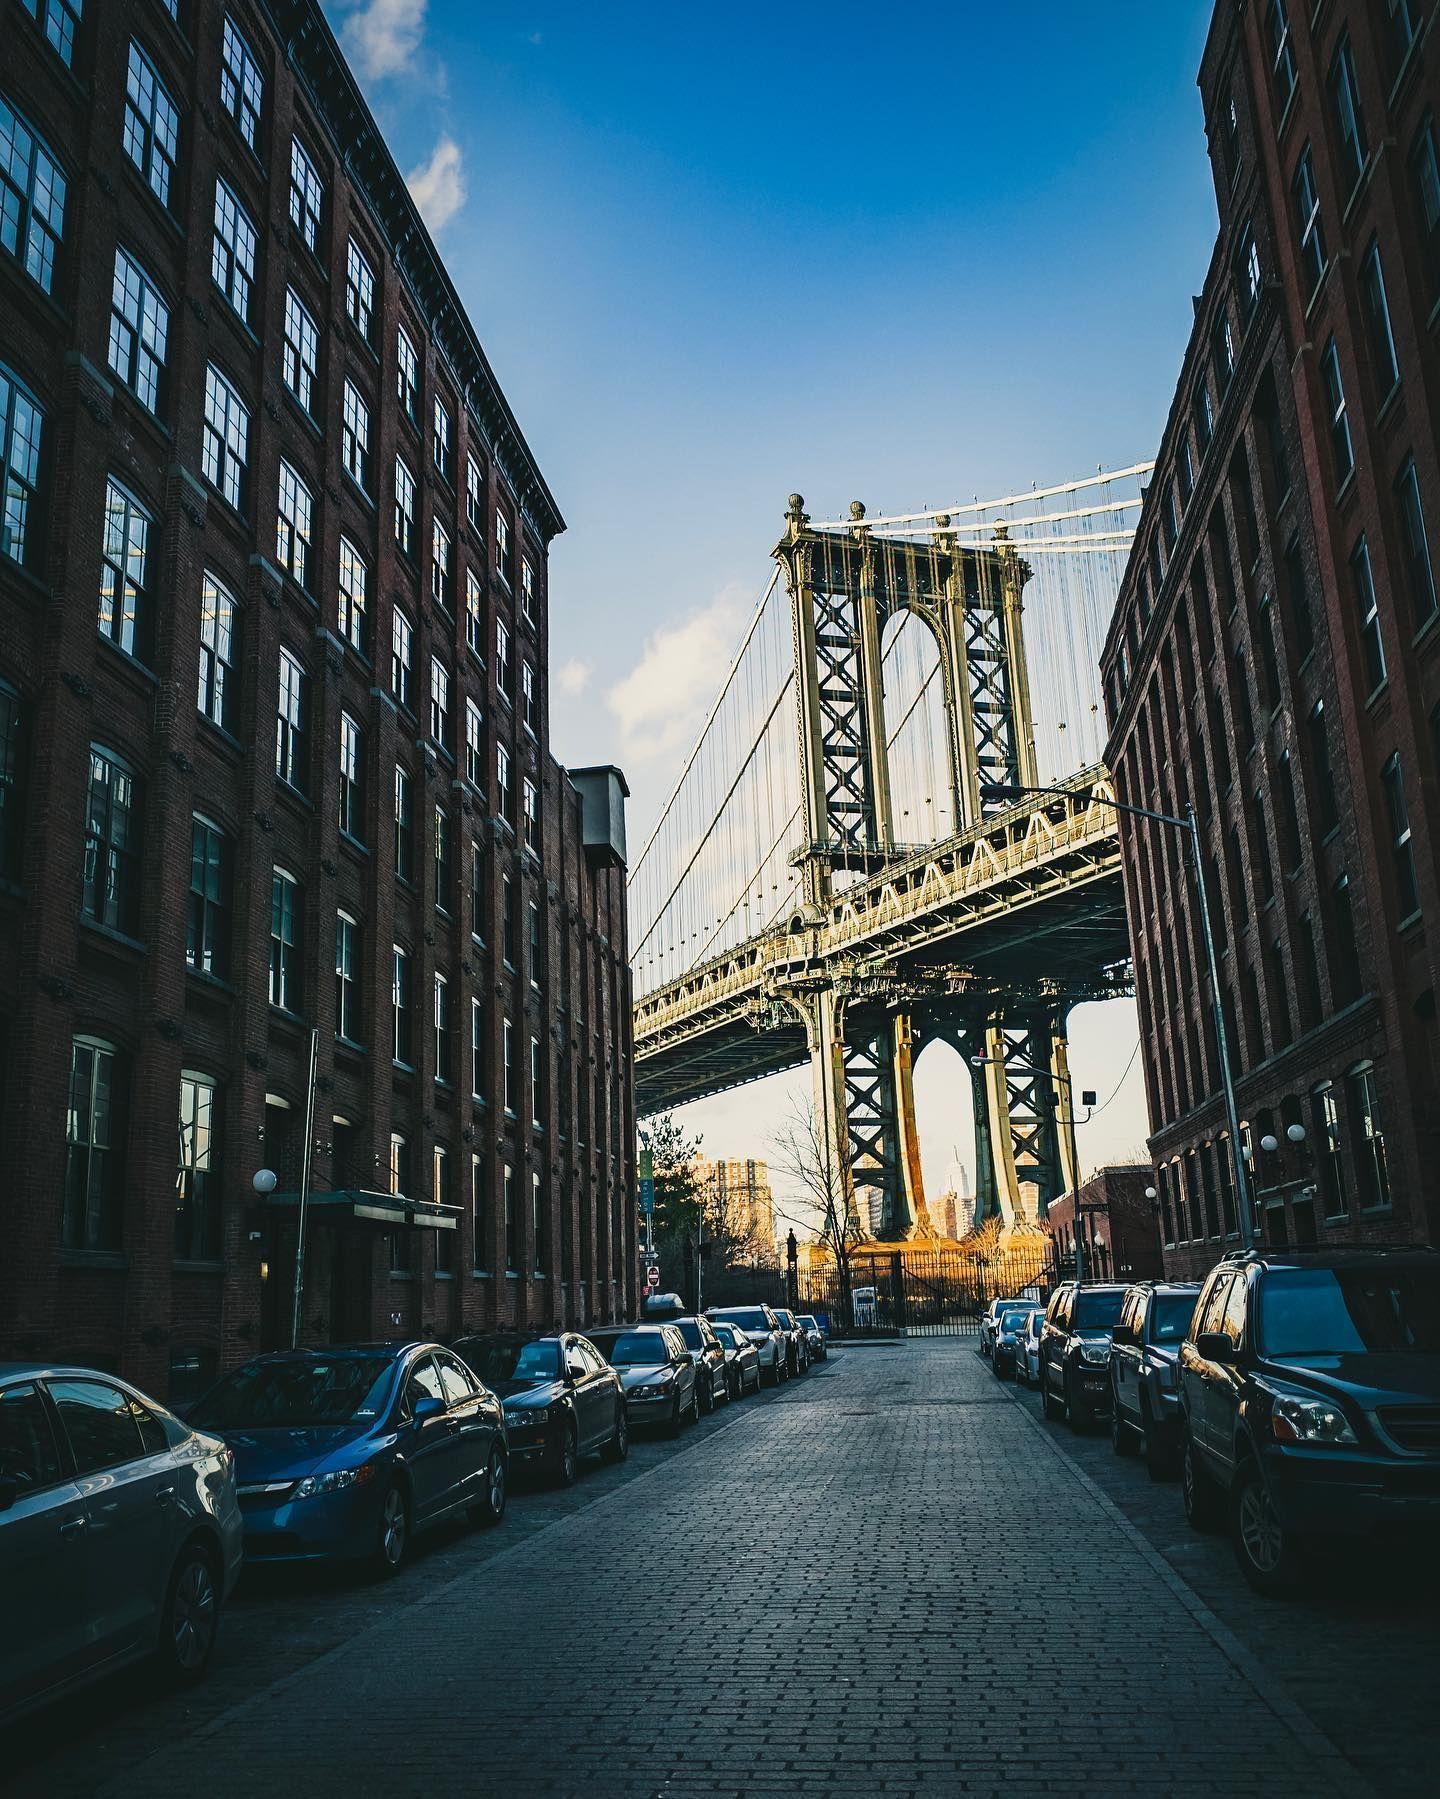 Dumbo in 2014  #onichie #osaka #japan #osakajapan #大阪 #日本 #オニッチ #おにっち #fromosaka #fromjapan #omg #onichiemusicgarage #ツァイスBatisで撮りたい #aestheticsjapan #shotonlexar #ricoh #ricohgr #gr #grist #shotongr #newyork #newyorkcity #nyc #dumbo #brooklyn #manhattanbridge